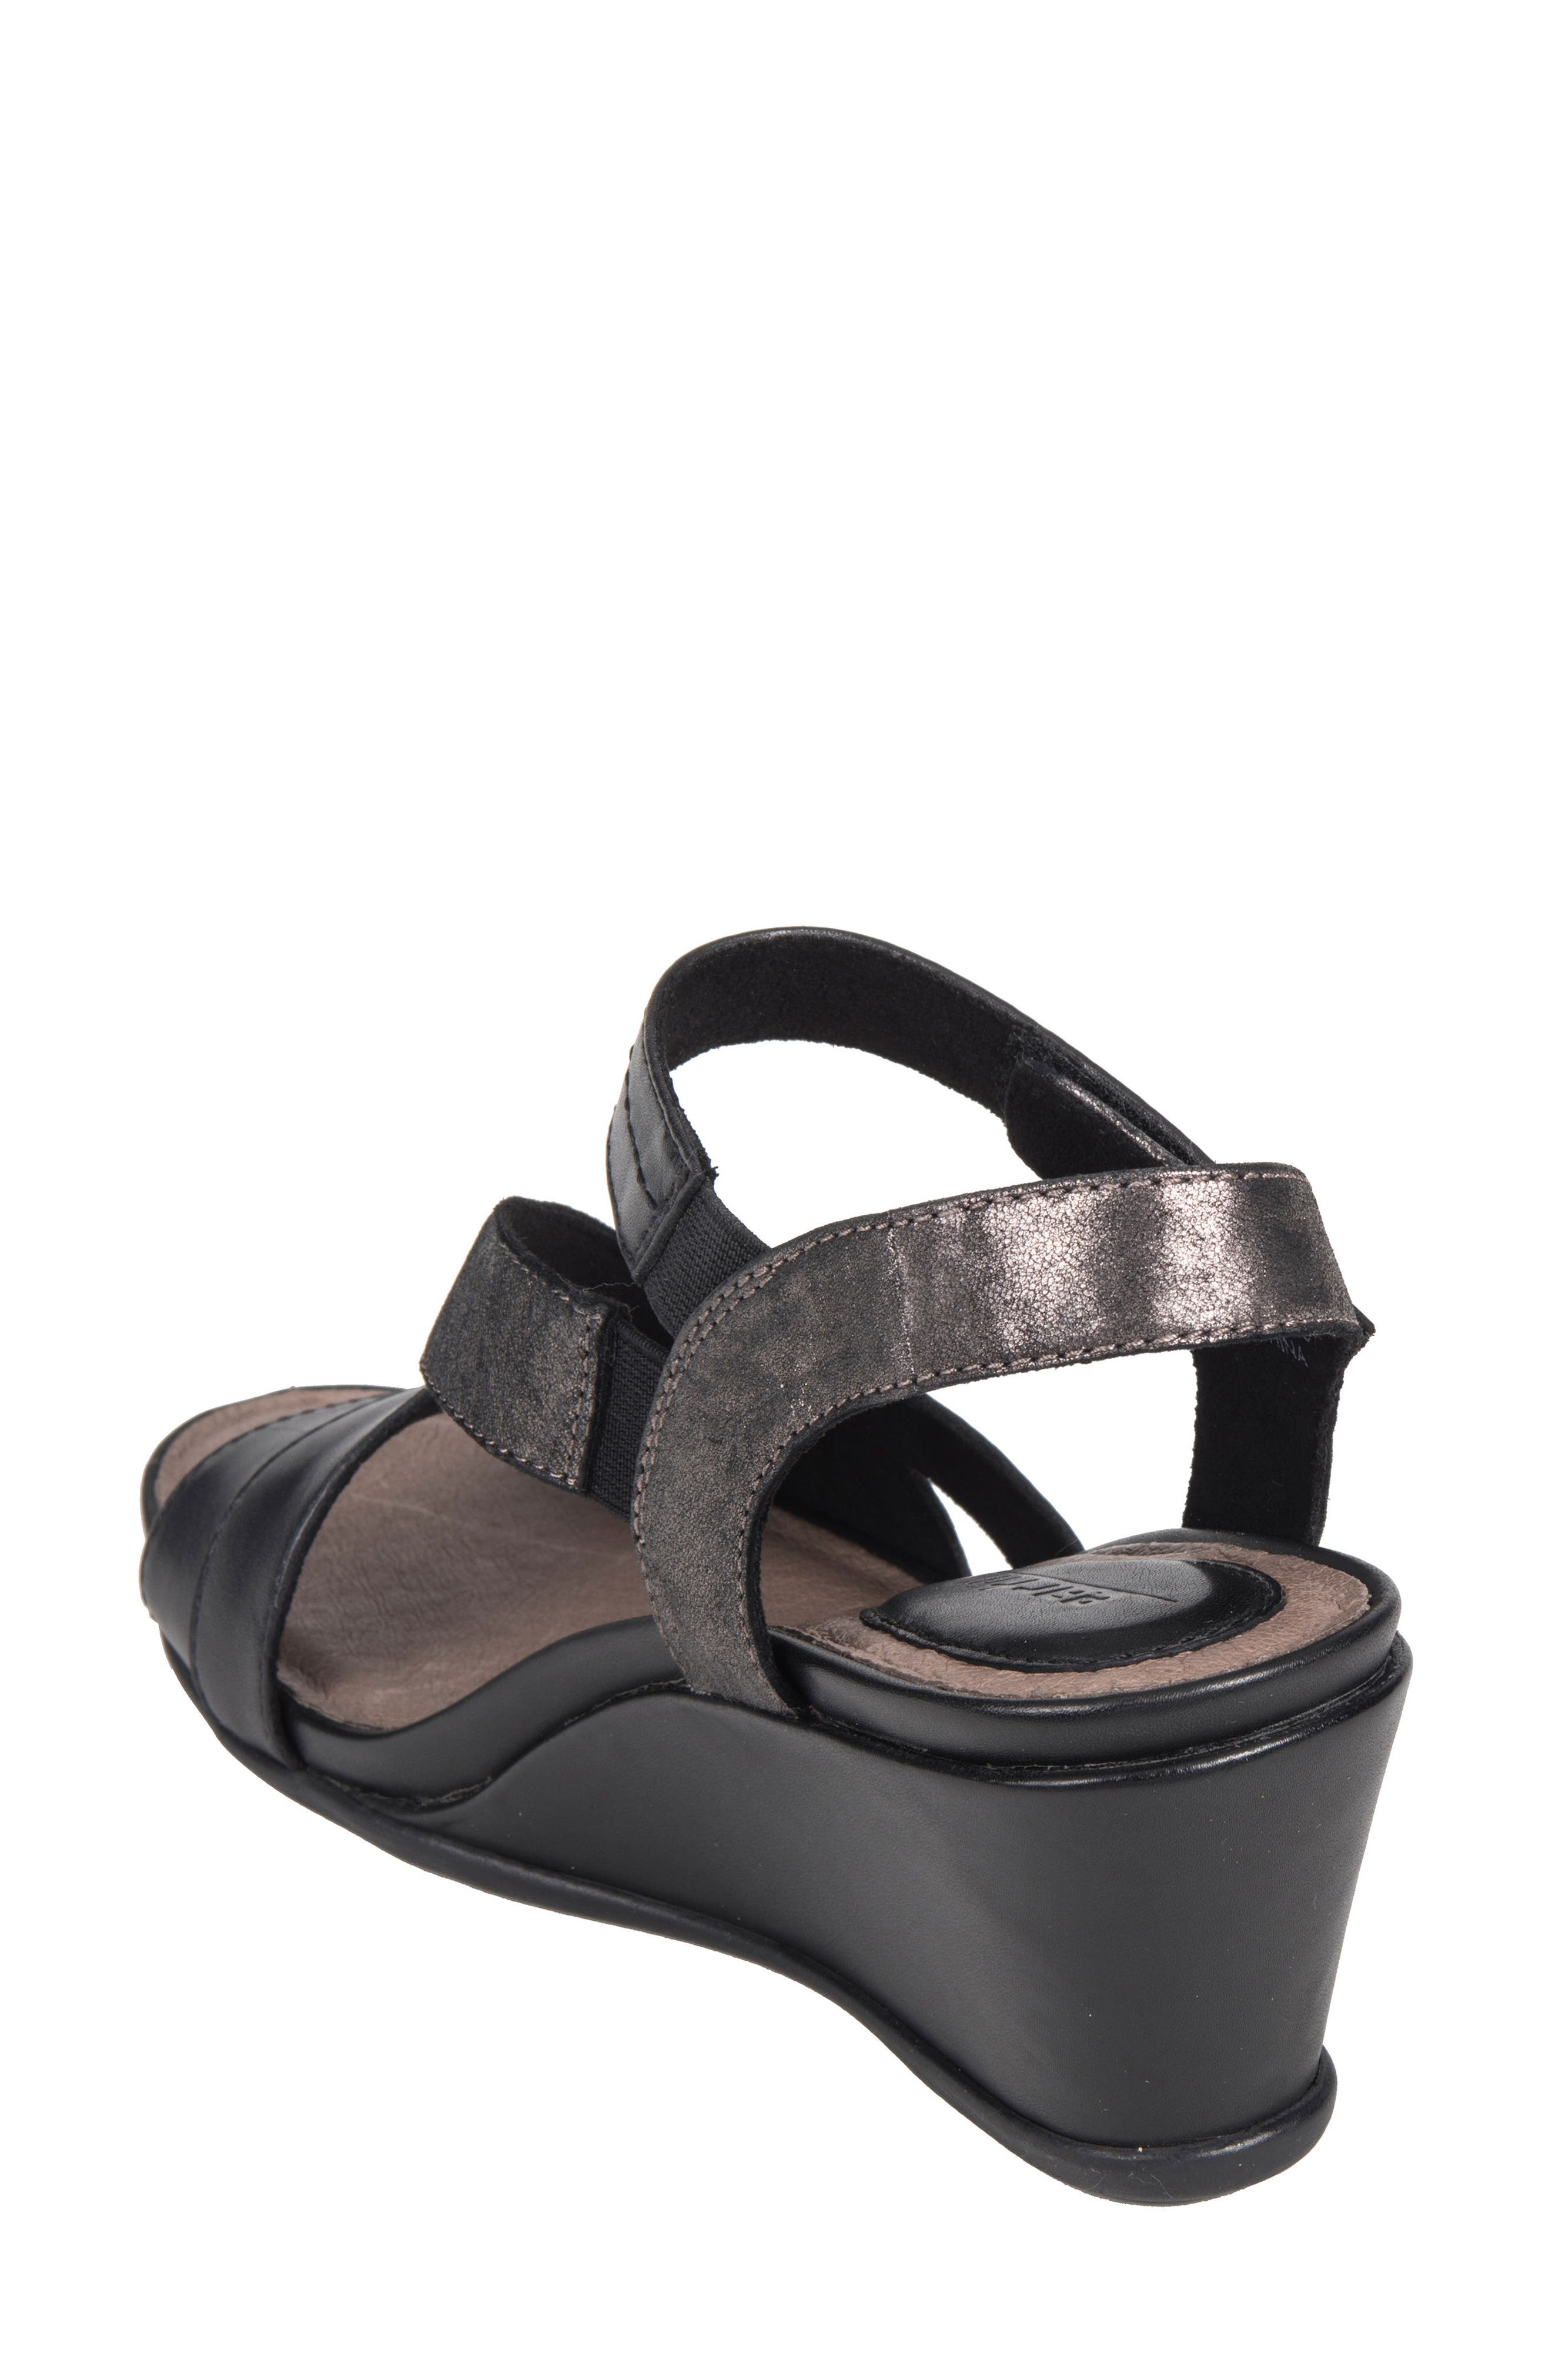 Thistle Wedge Sandal,                             Alternate thumbnail 6, color,                             001